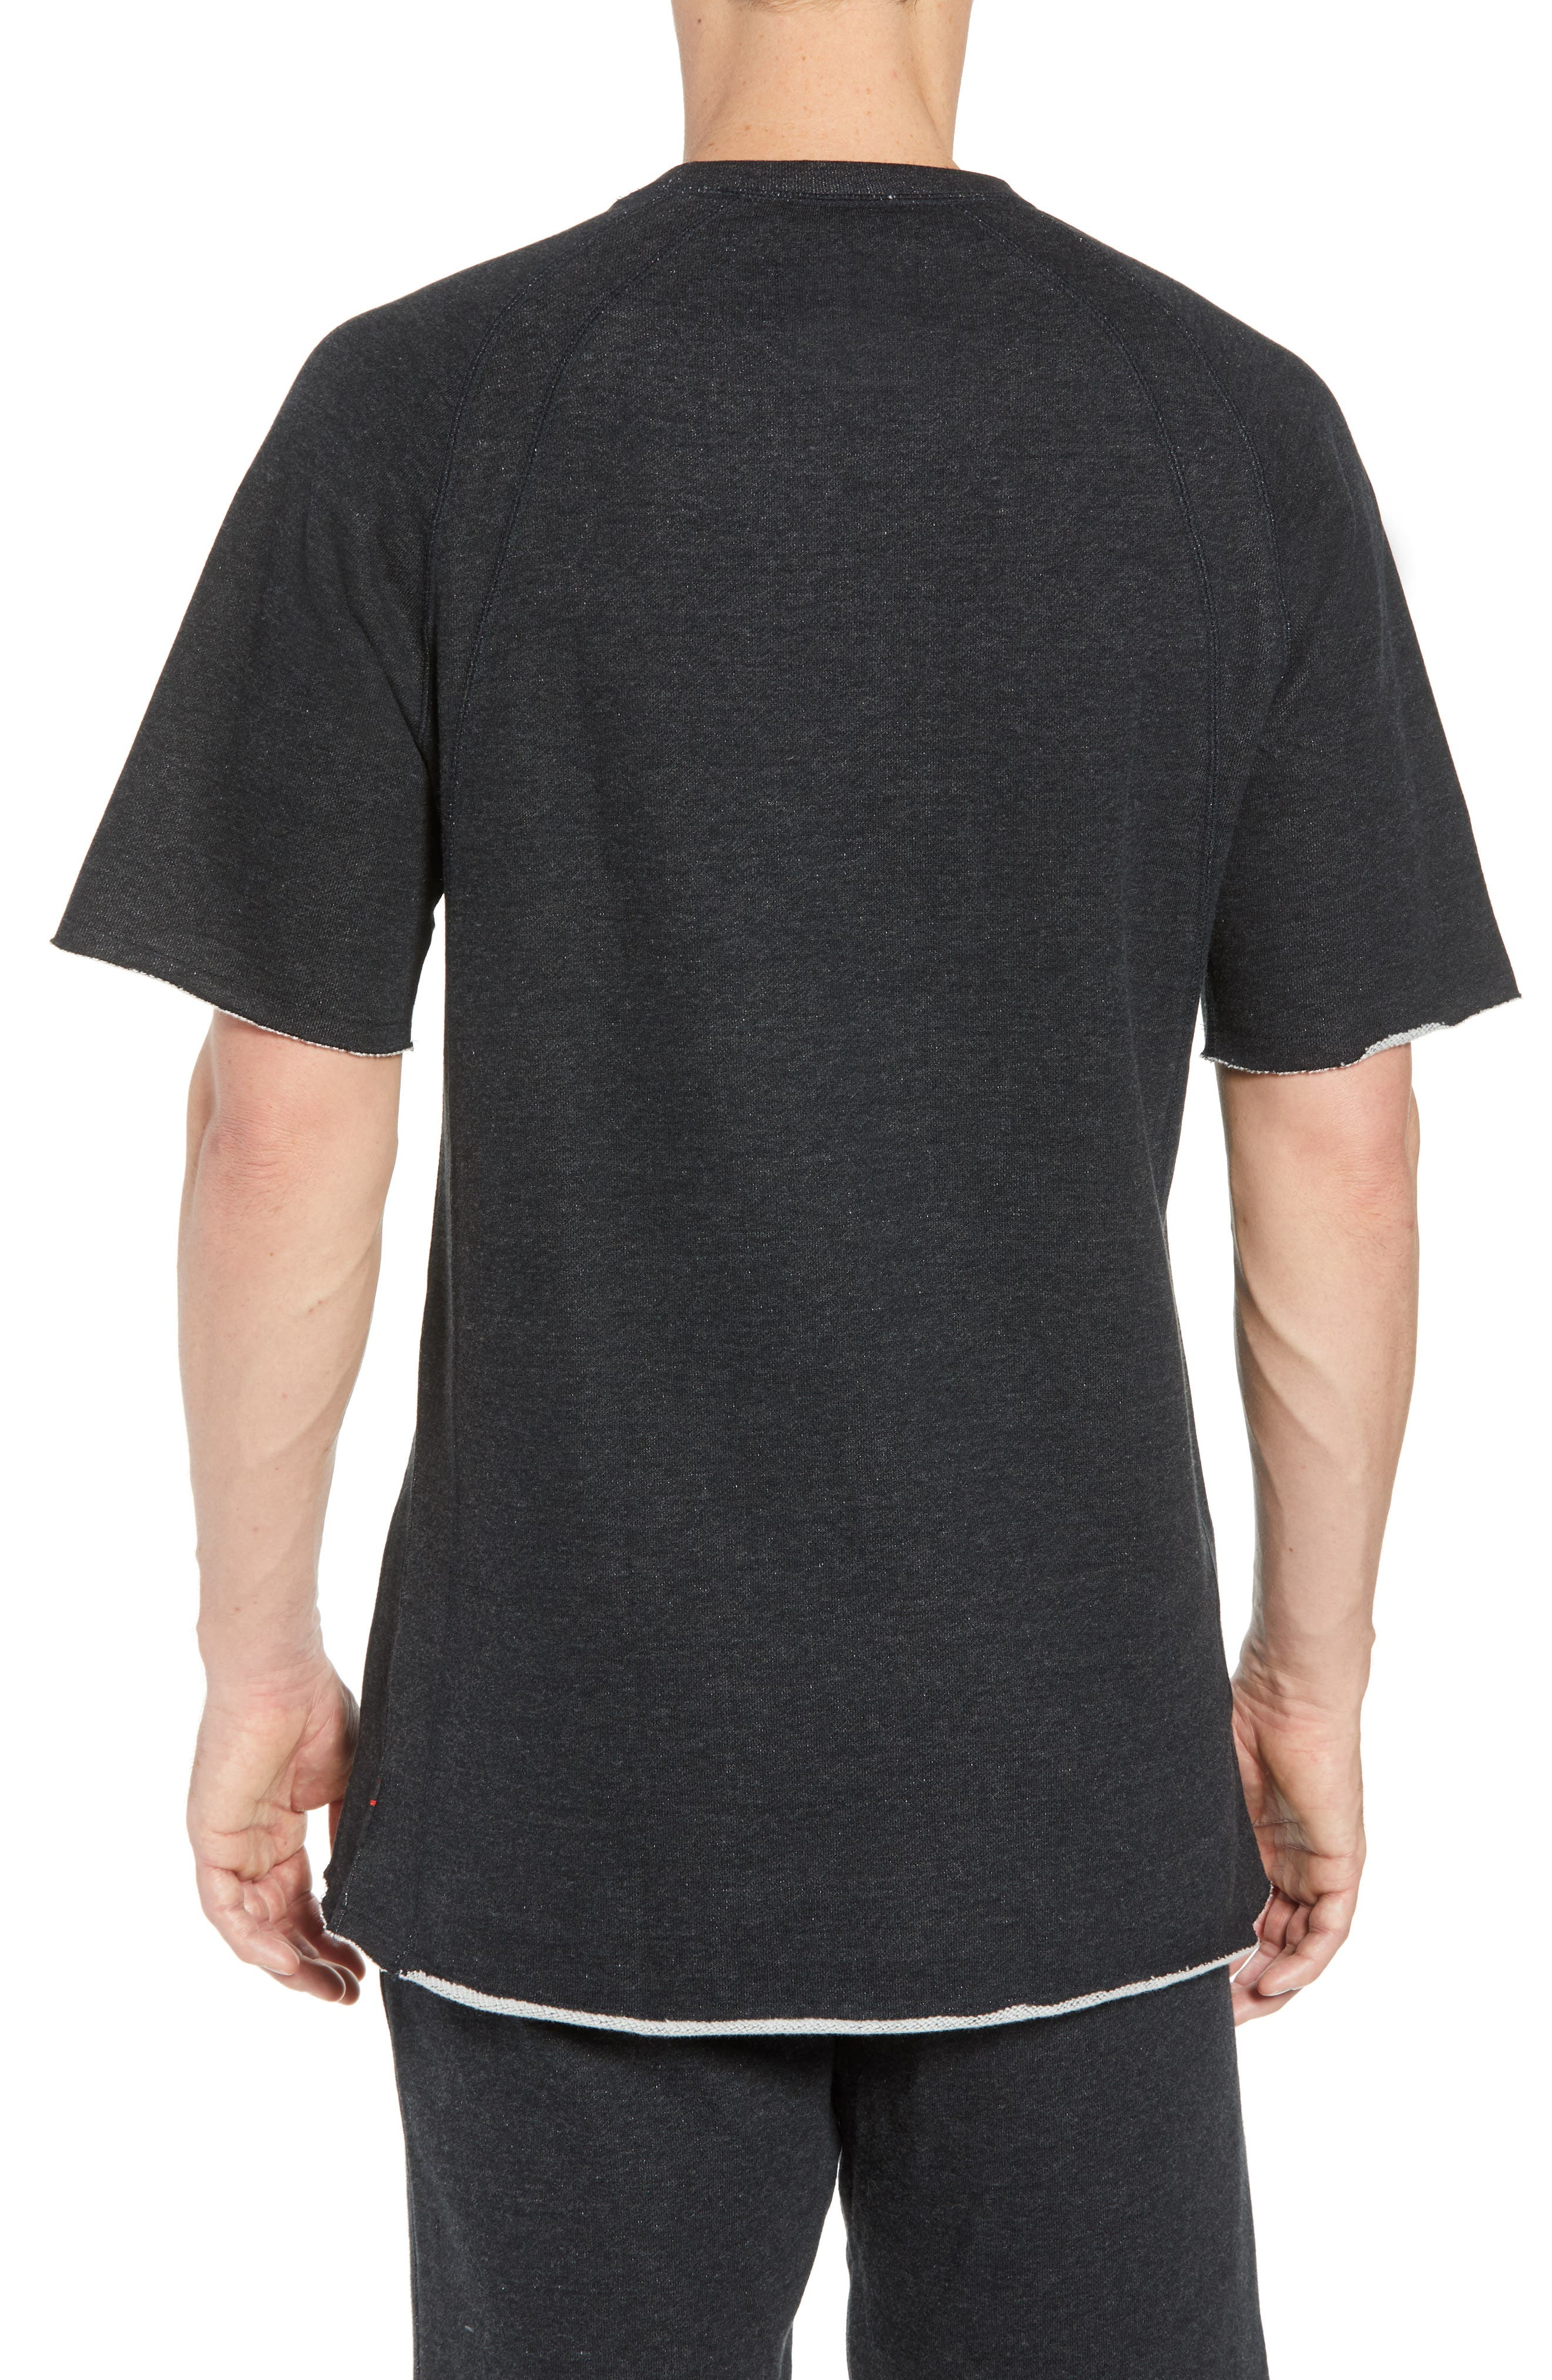 Wings Light Short Sleeve Sweatshirt,                             Alternate thumbnail 2, color,                             BLACK HEATHER/ BLACK